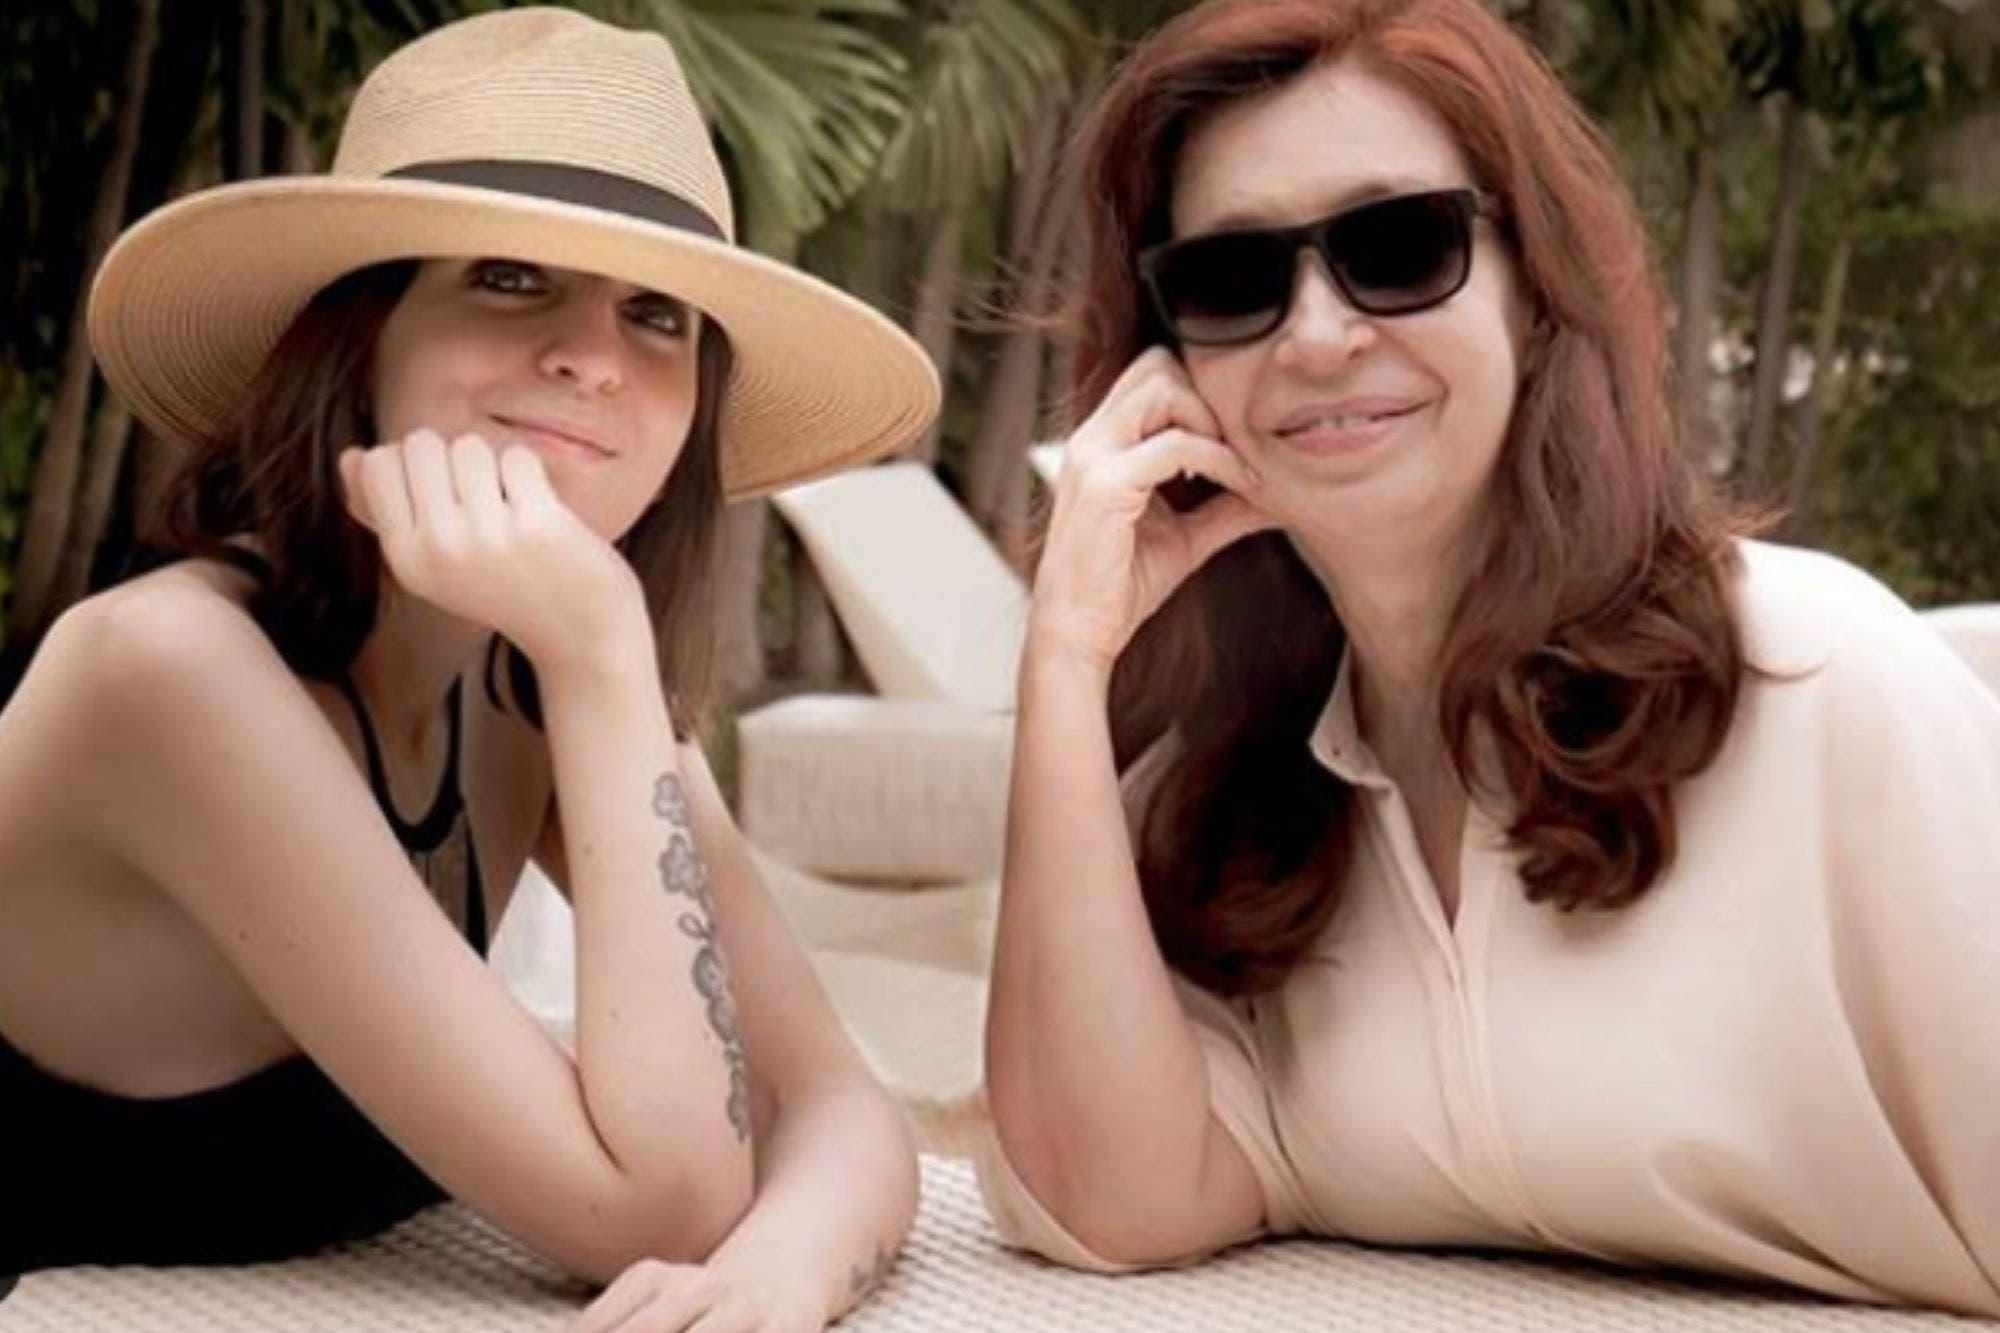 Actores Porno Cubanos cristina kirchner regresó a la argentina desde cuba, junto a